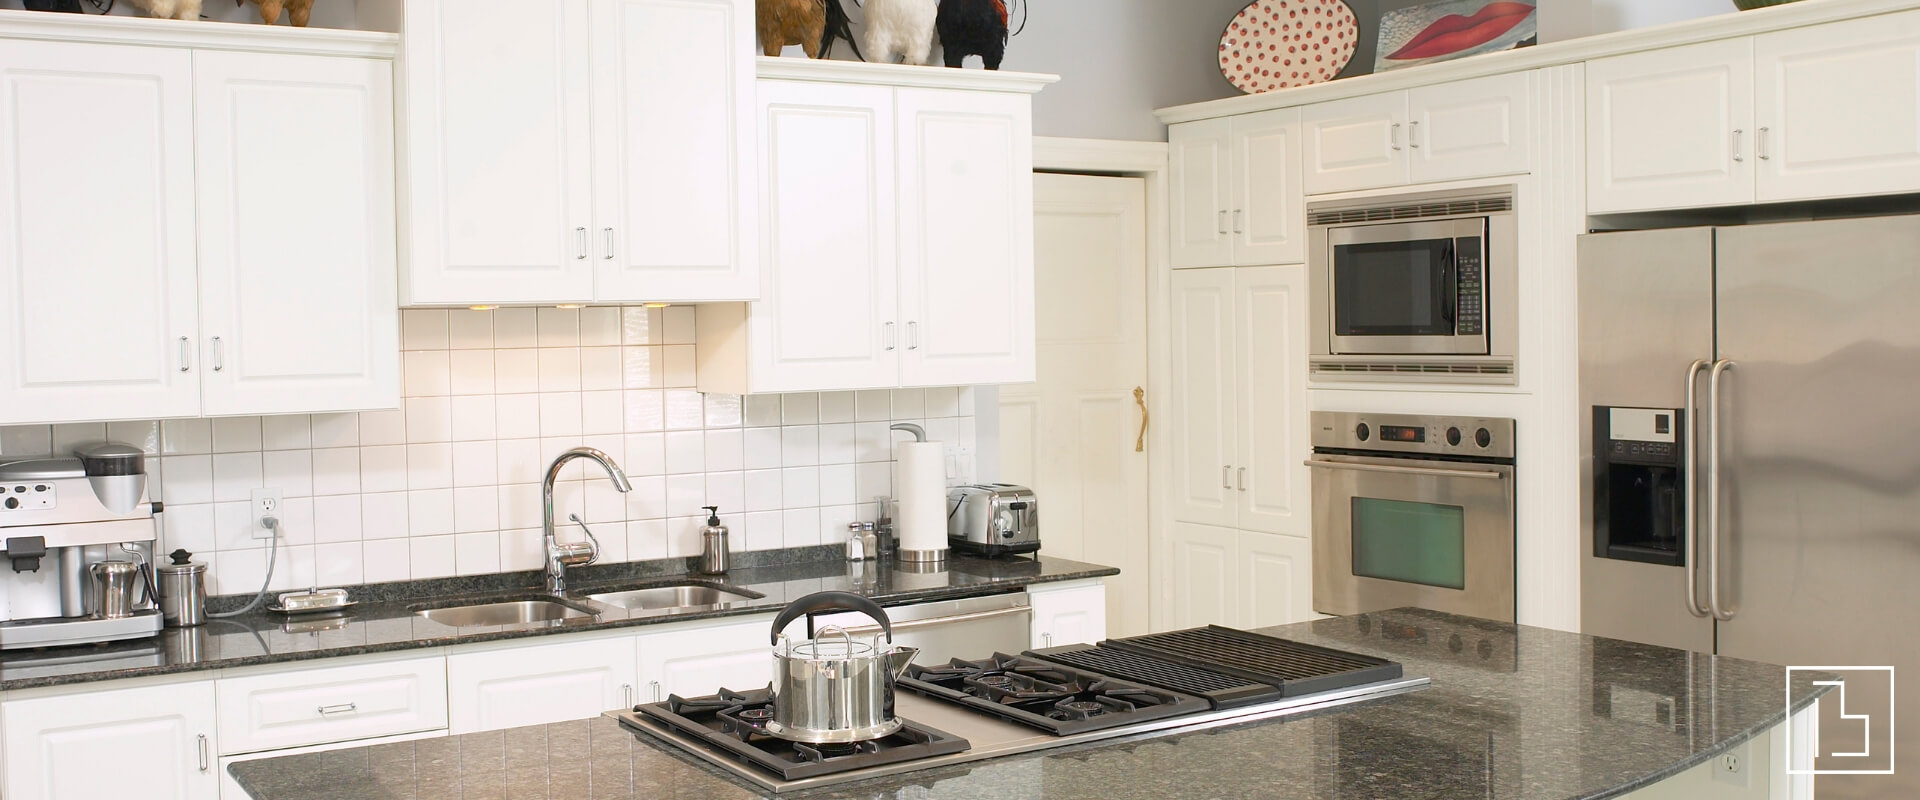 Photo of a generic kitchen - Beachworks LLC